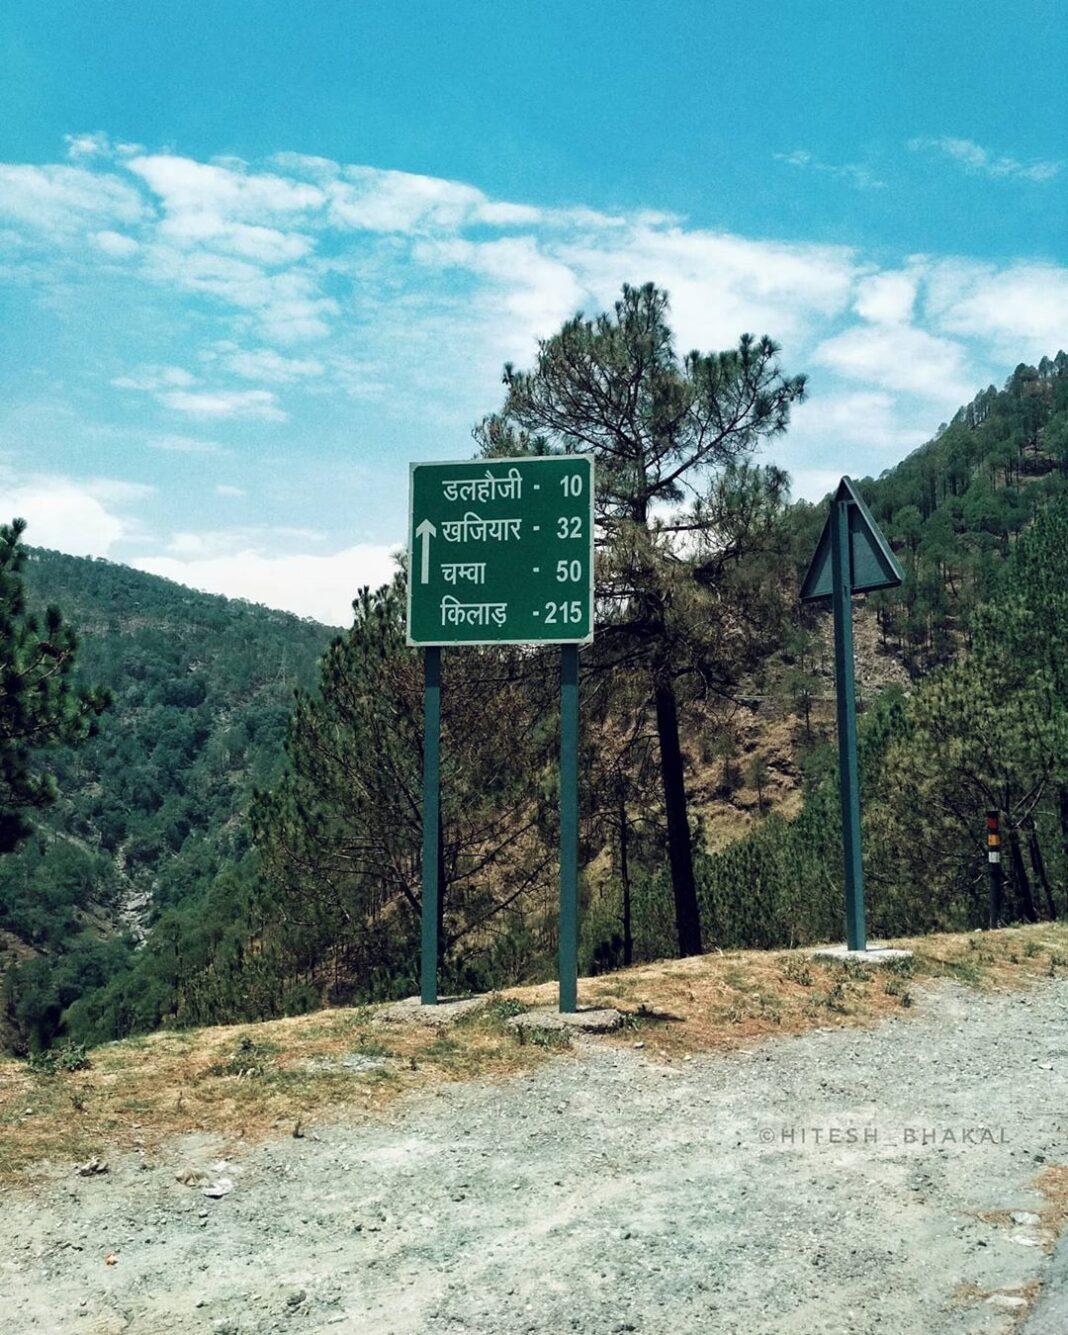 On the way to khajjiar - hitesh bhakal